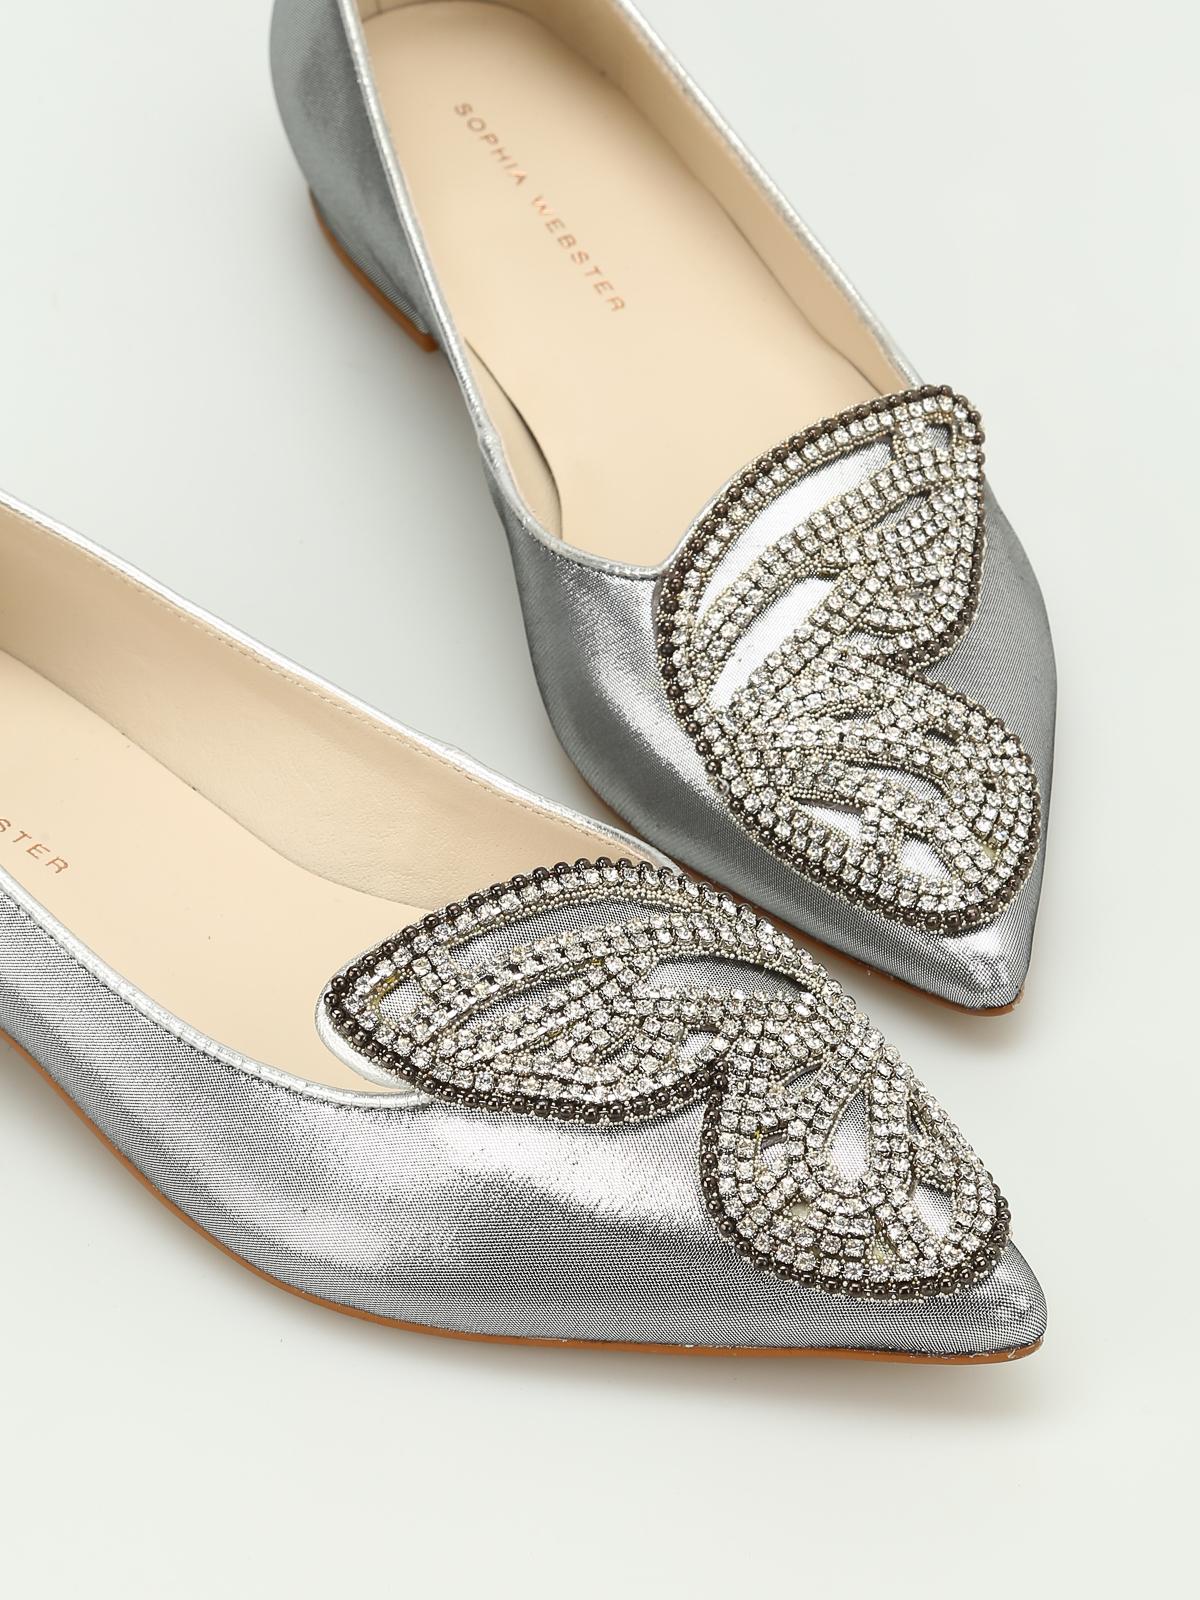 SOPHIA WEBSTER Bibi ballerina shoes fSCj5